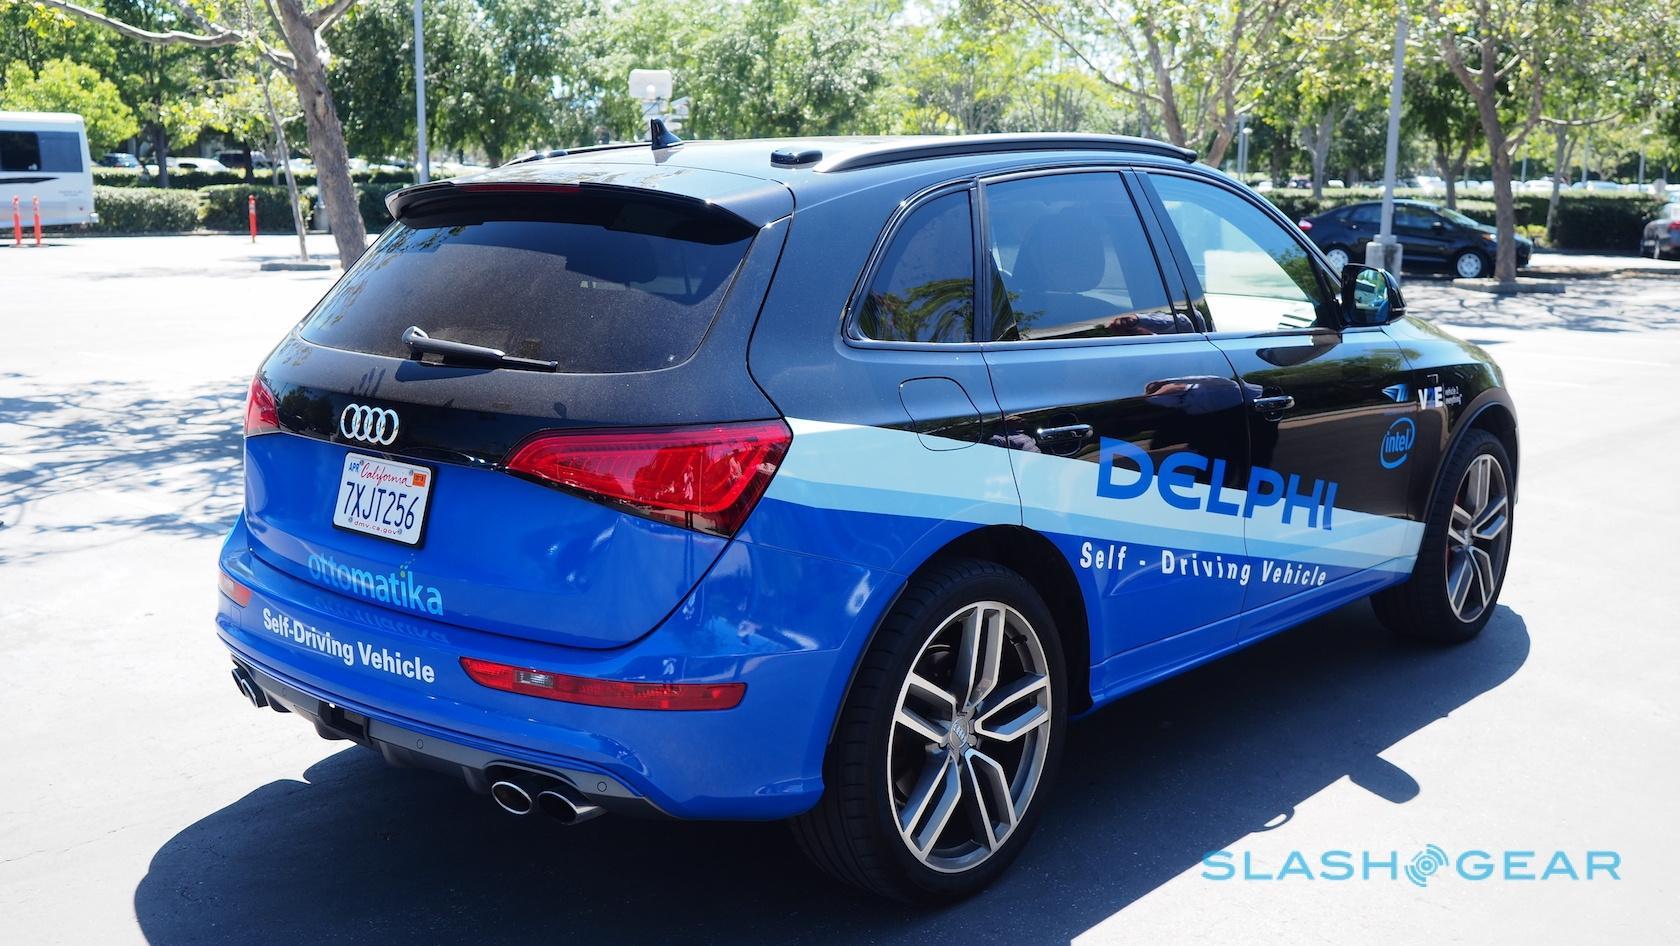 In Delphi's latest self-driving car, aggression is an option - SlashGear